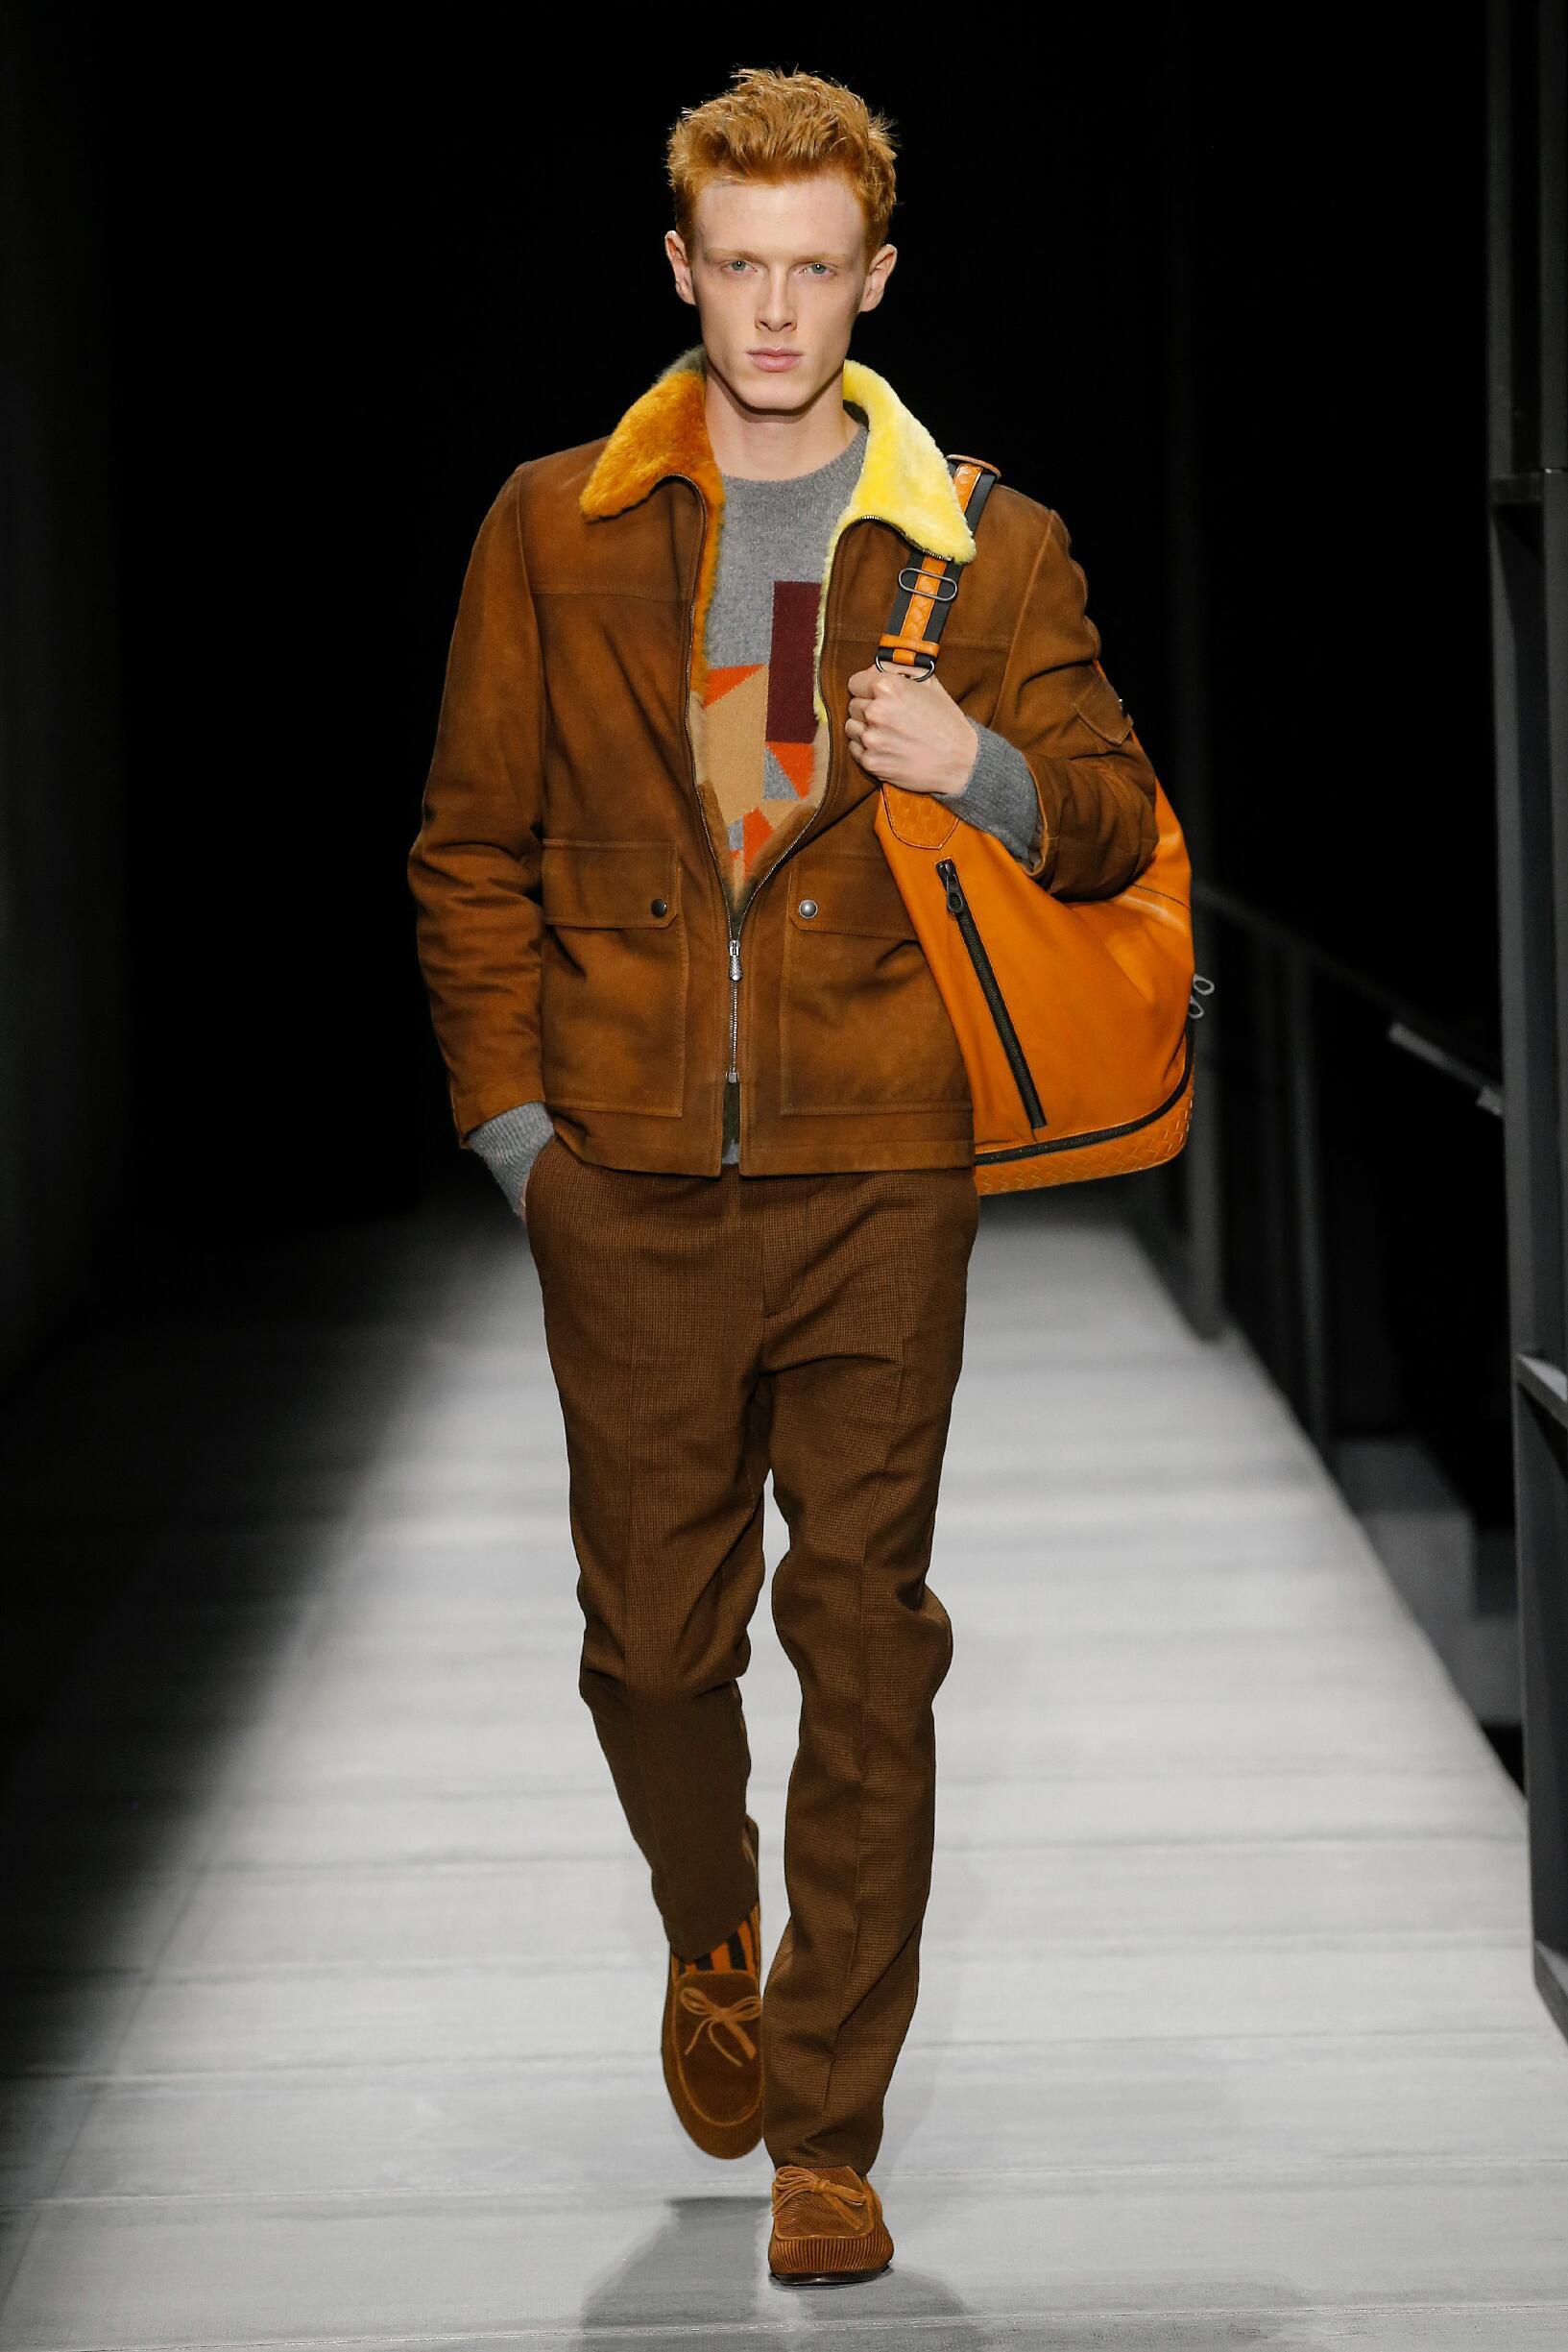 Winter 2018 Man Trends Bottega Veneta